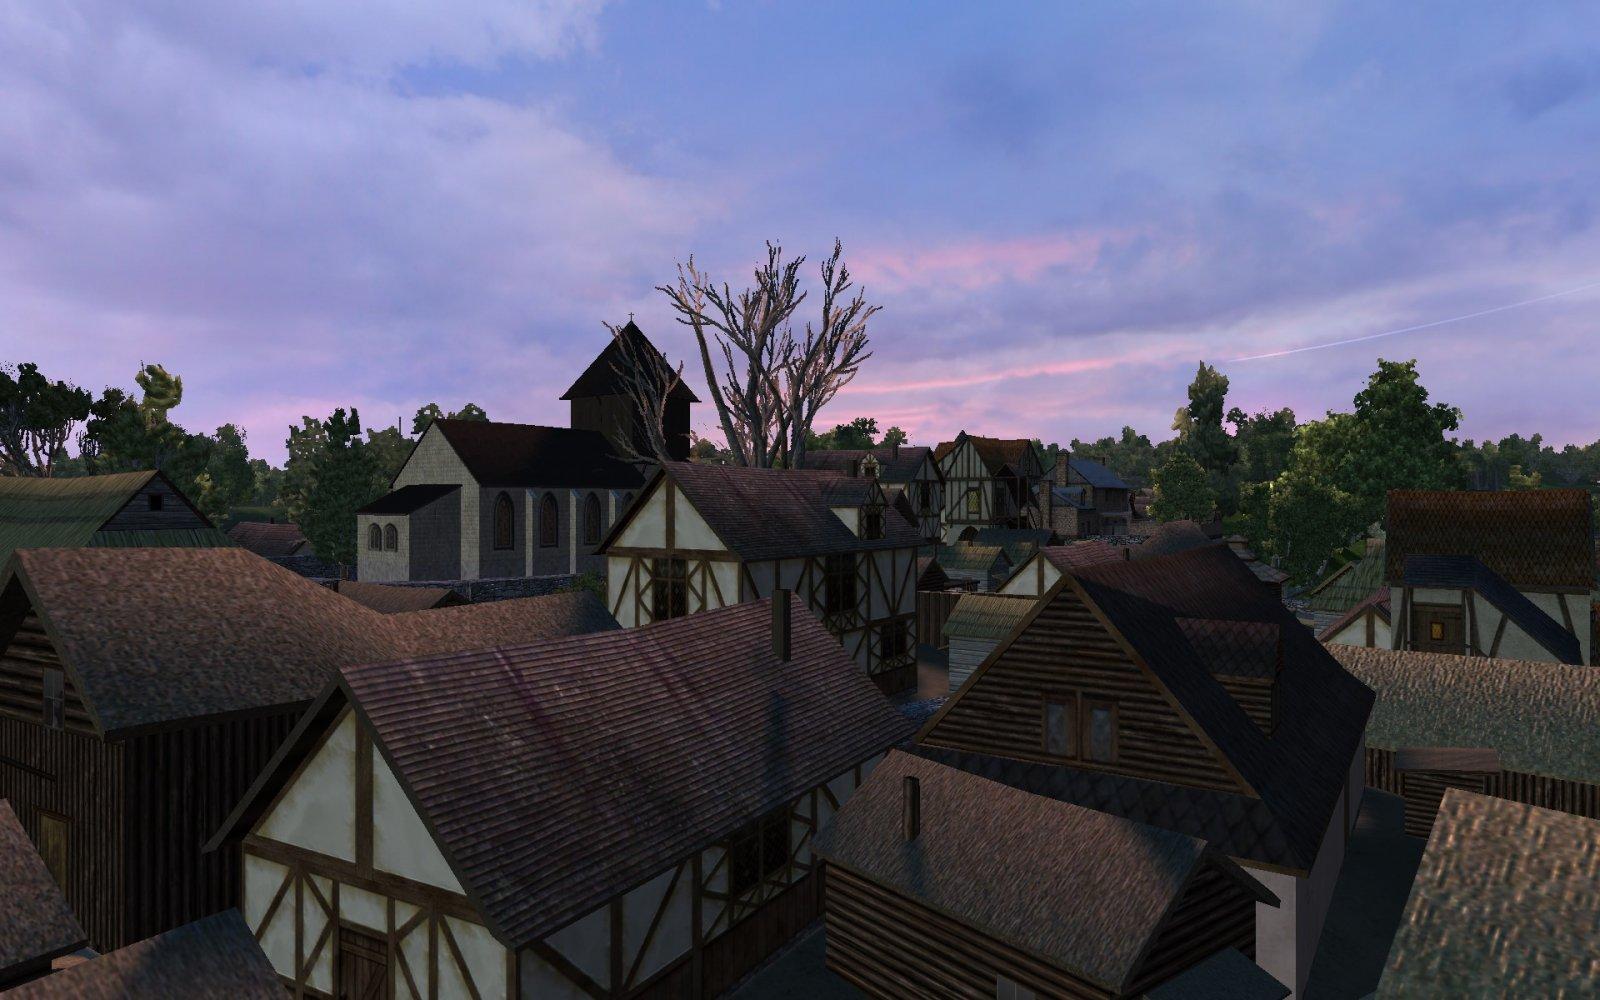 Medievalpack1_im06.jpg